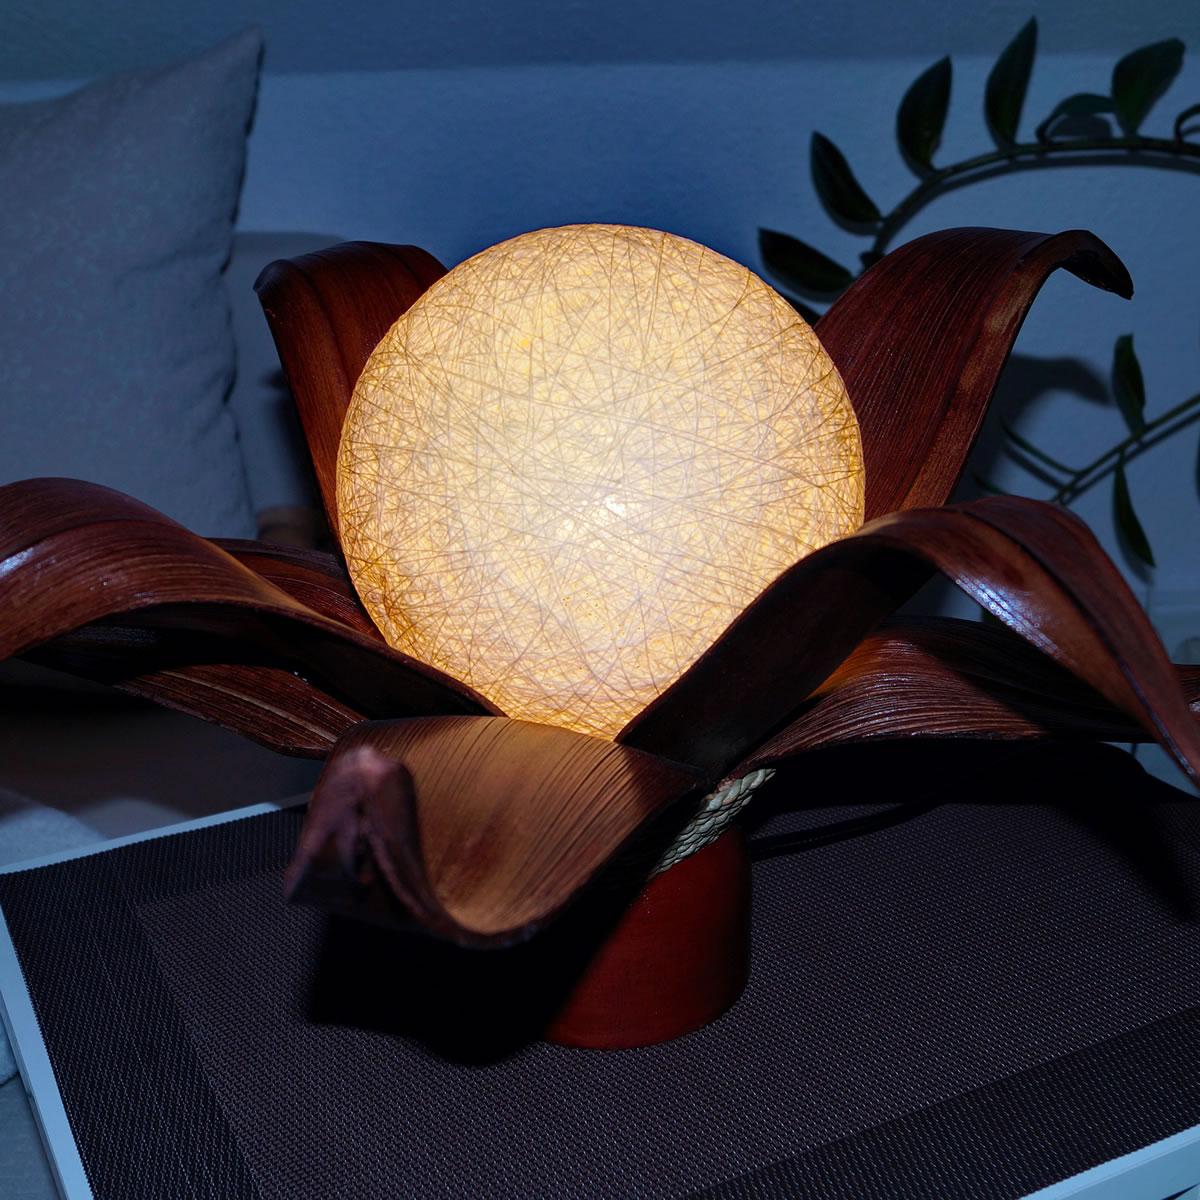 art decor Tischlampe / Lampe-Blüte mit Kokospalmemblättern ...